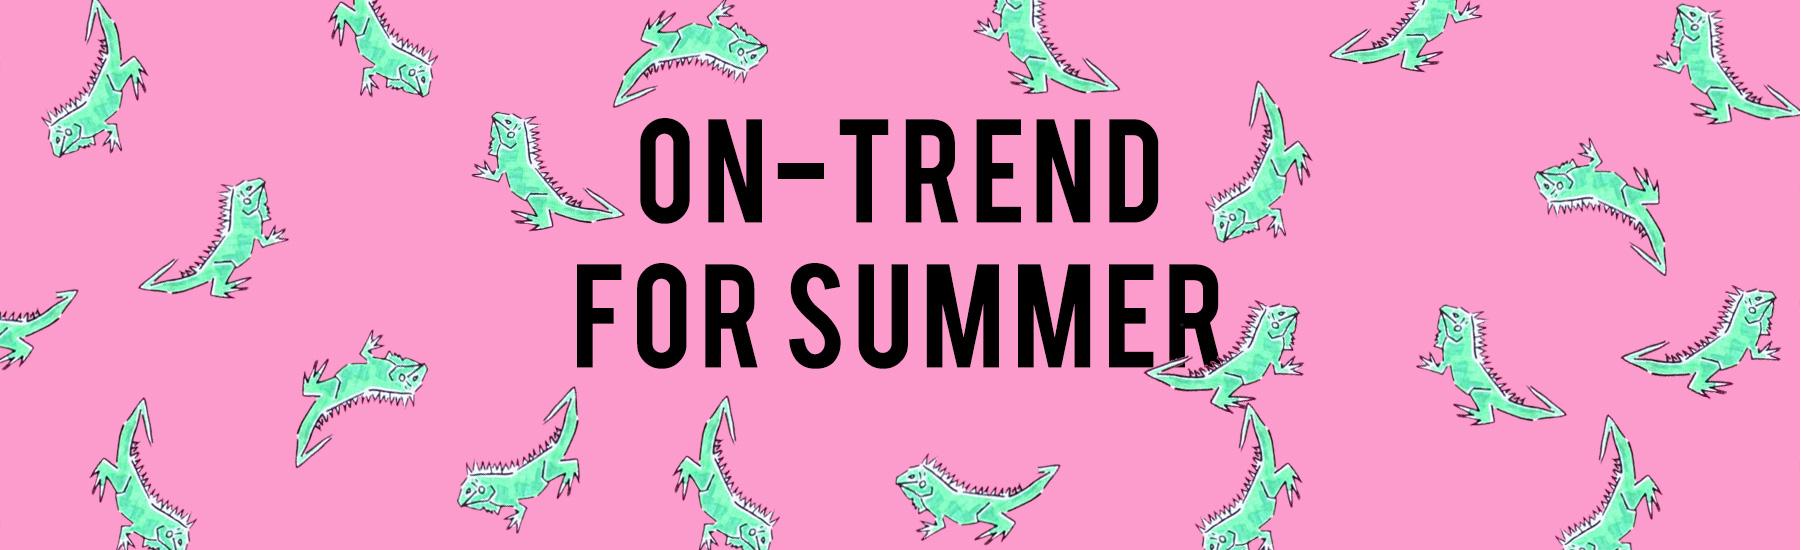 On-Trend For Summer - Shop Women's Summer Shop